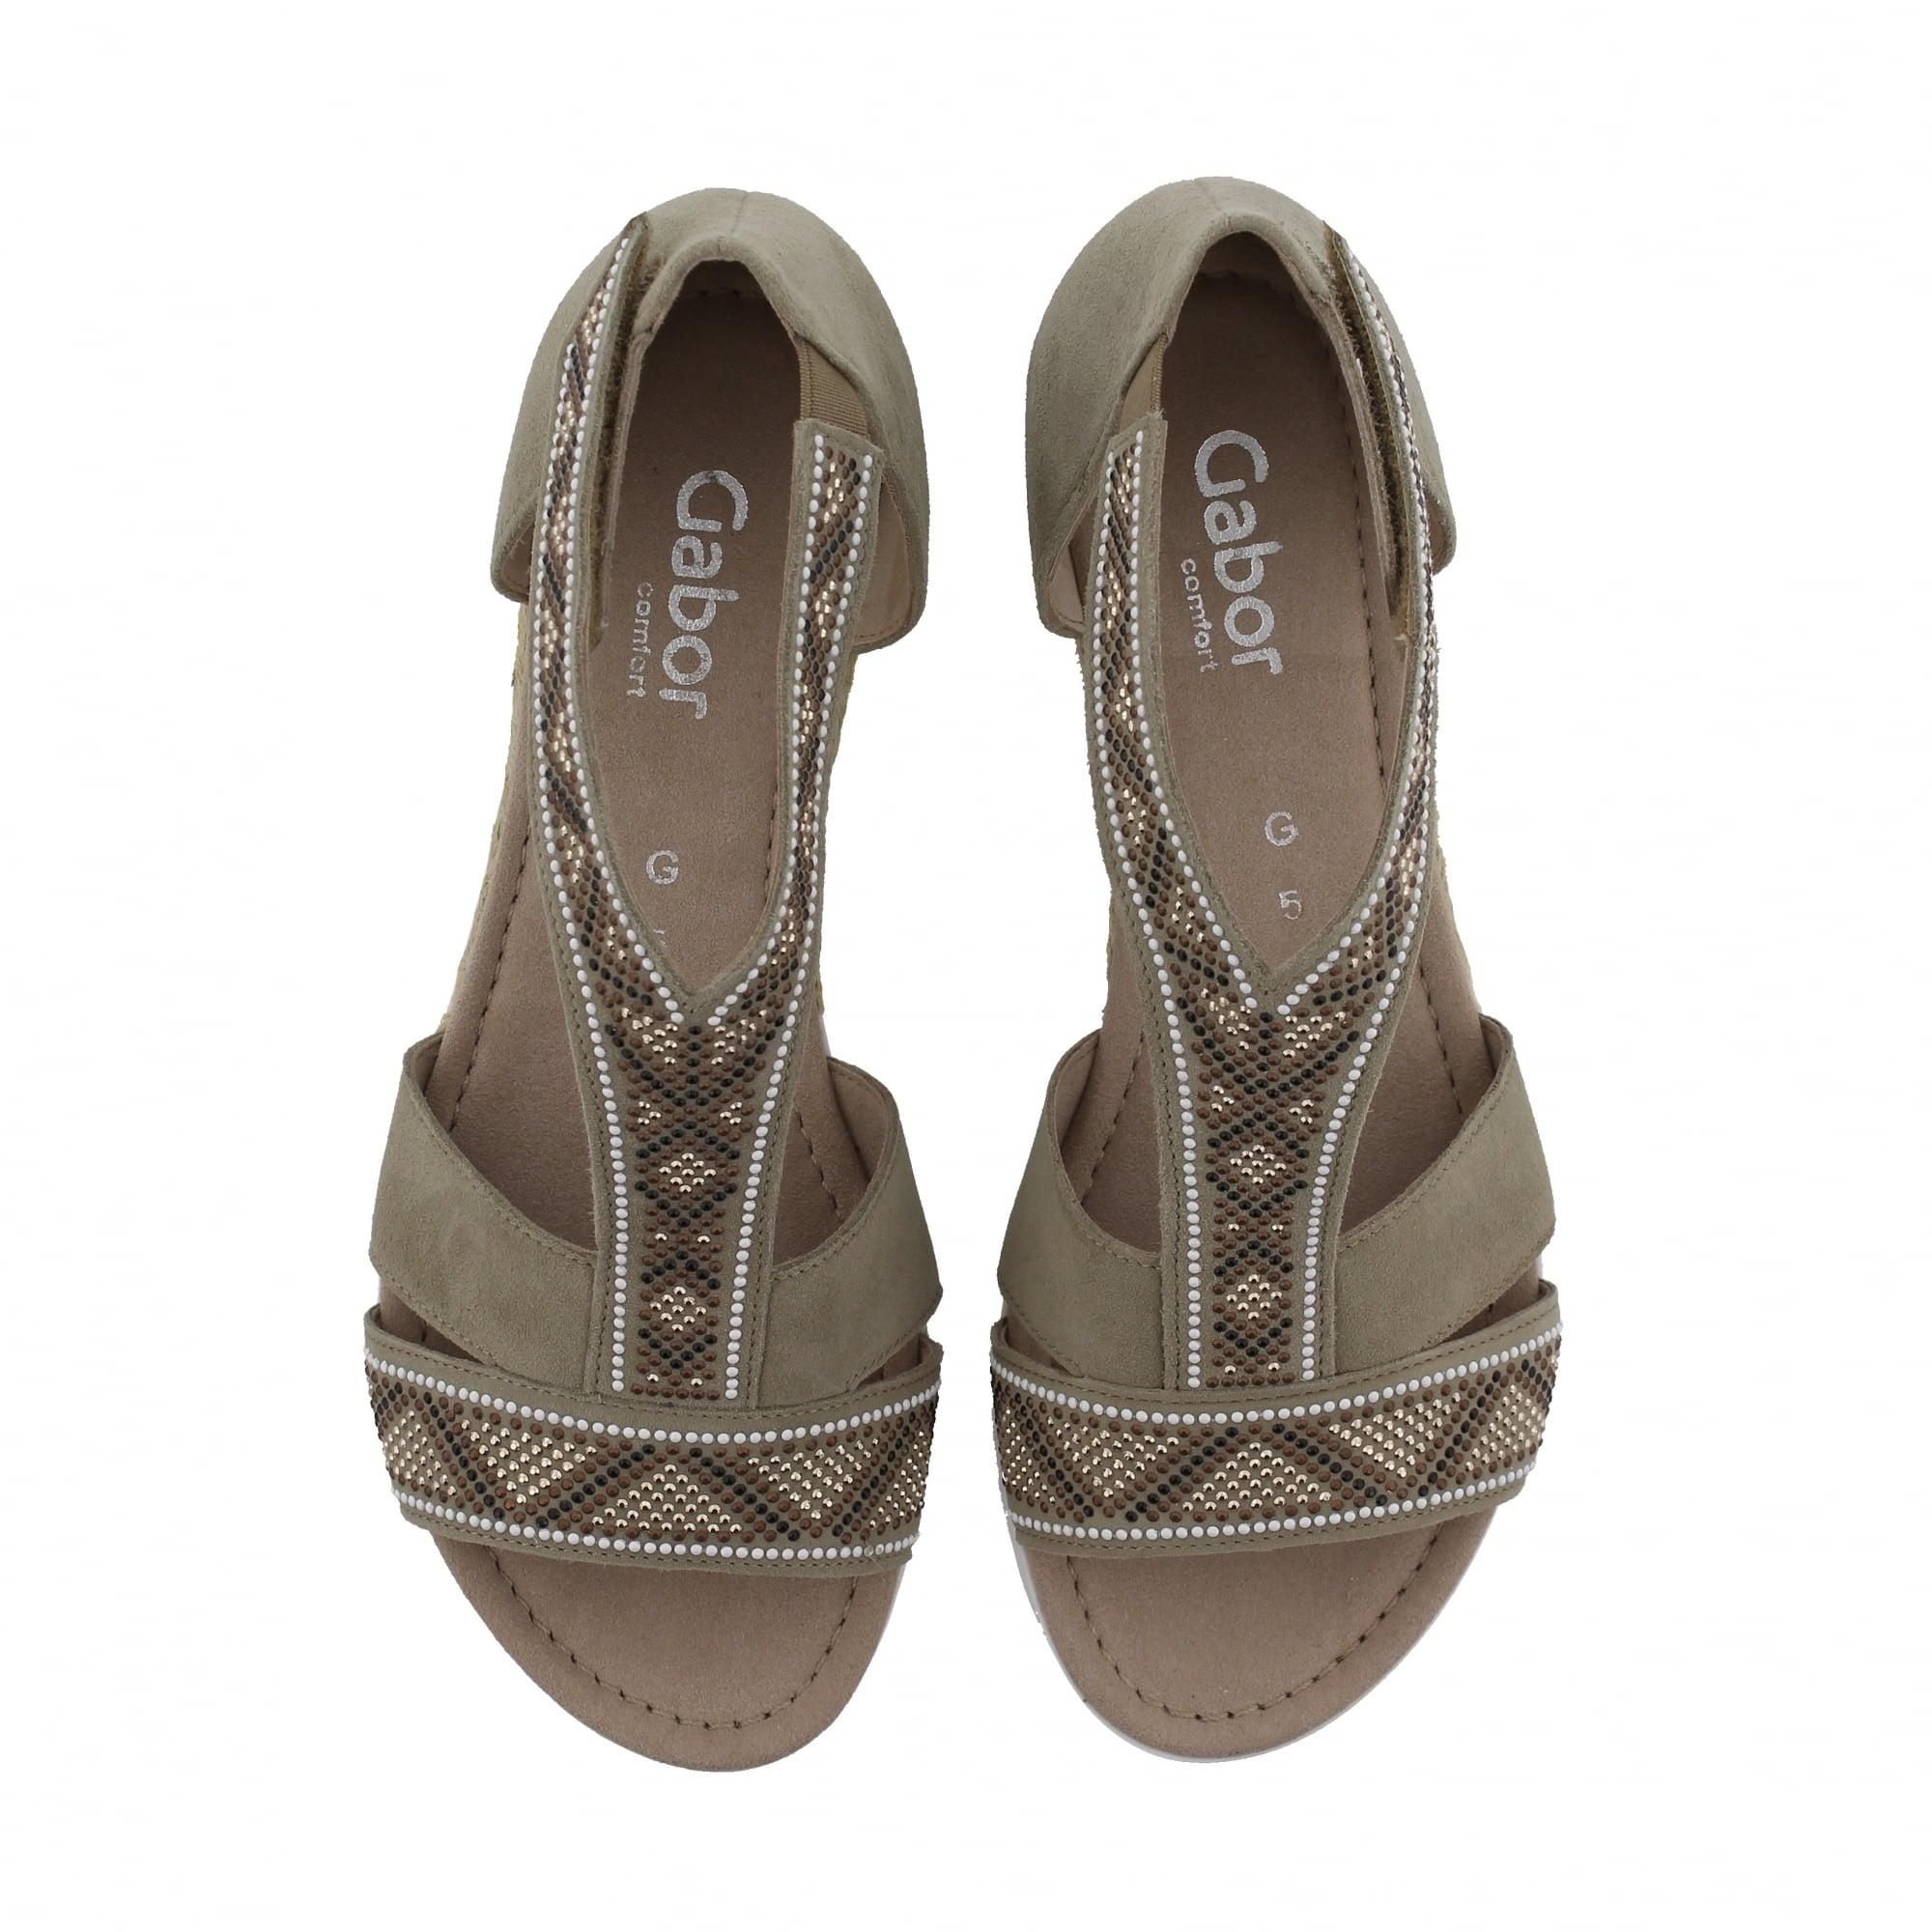 77fc9a90b640 Gabor Kara 82-713-24 Taupe Suede Womens Sandals